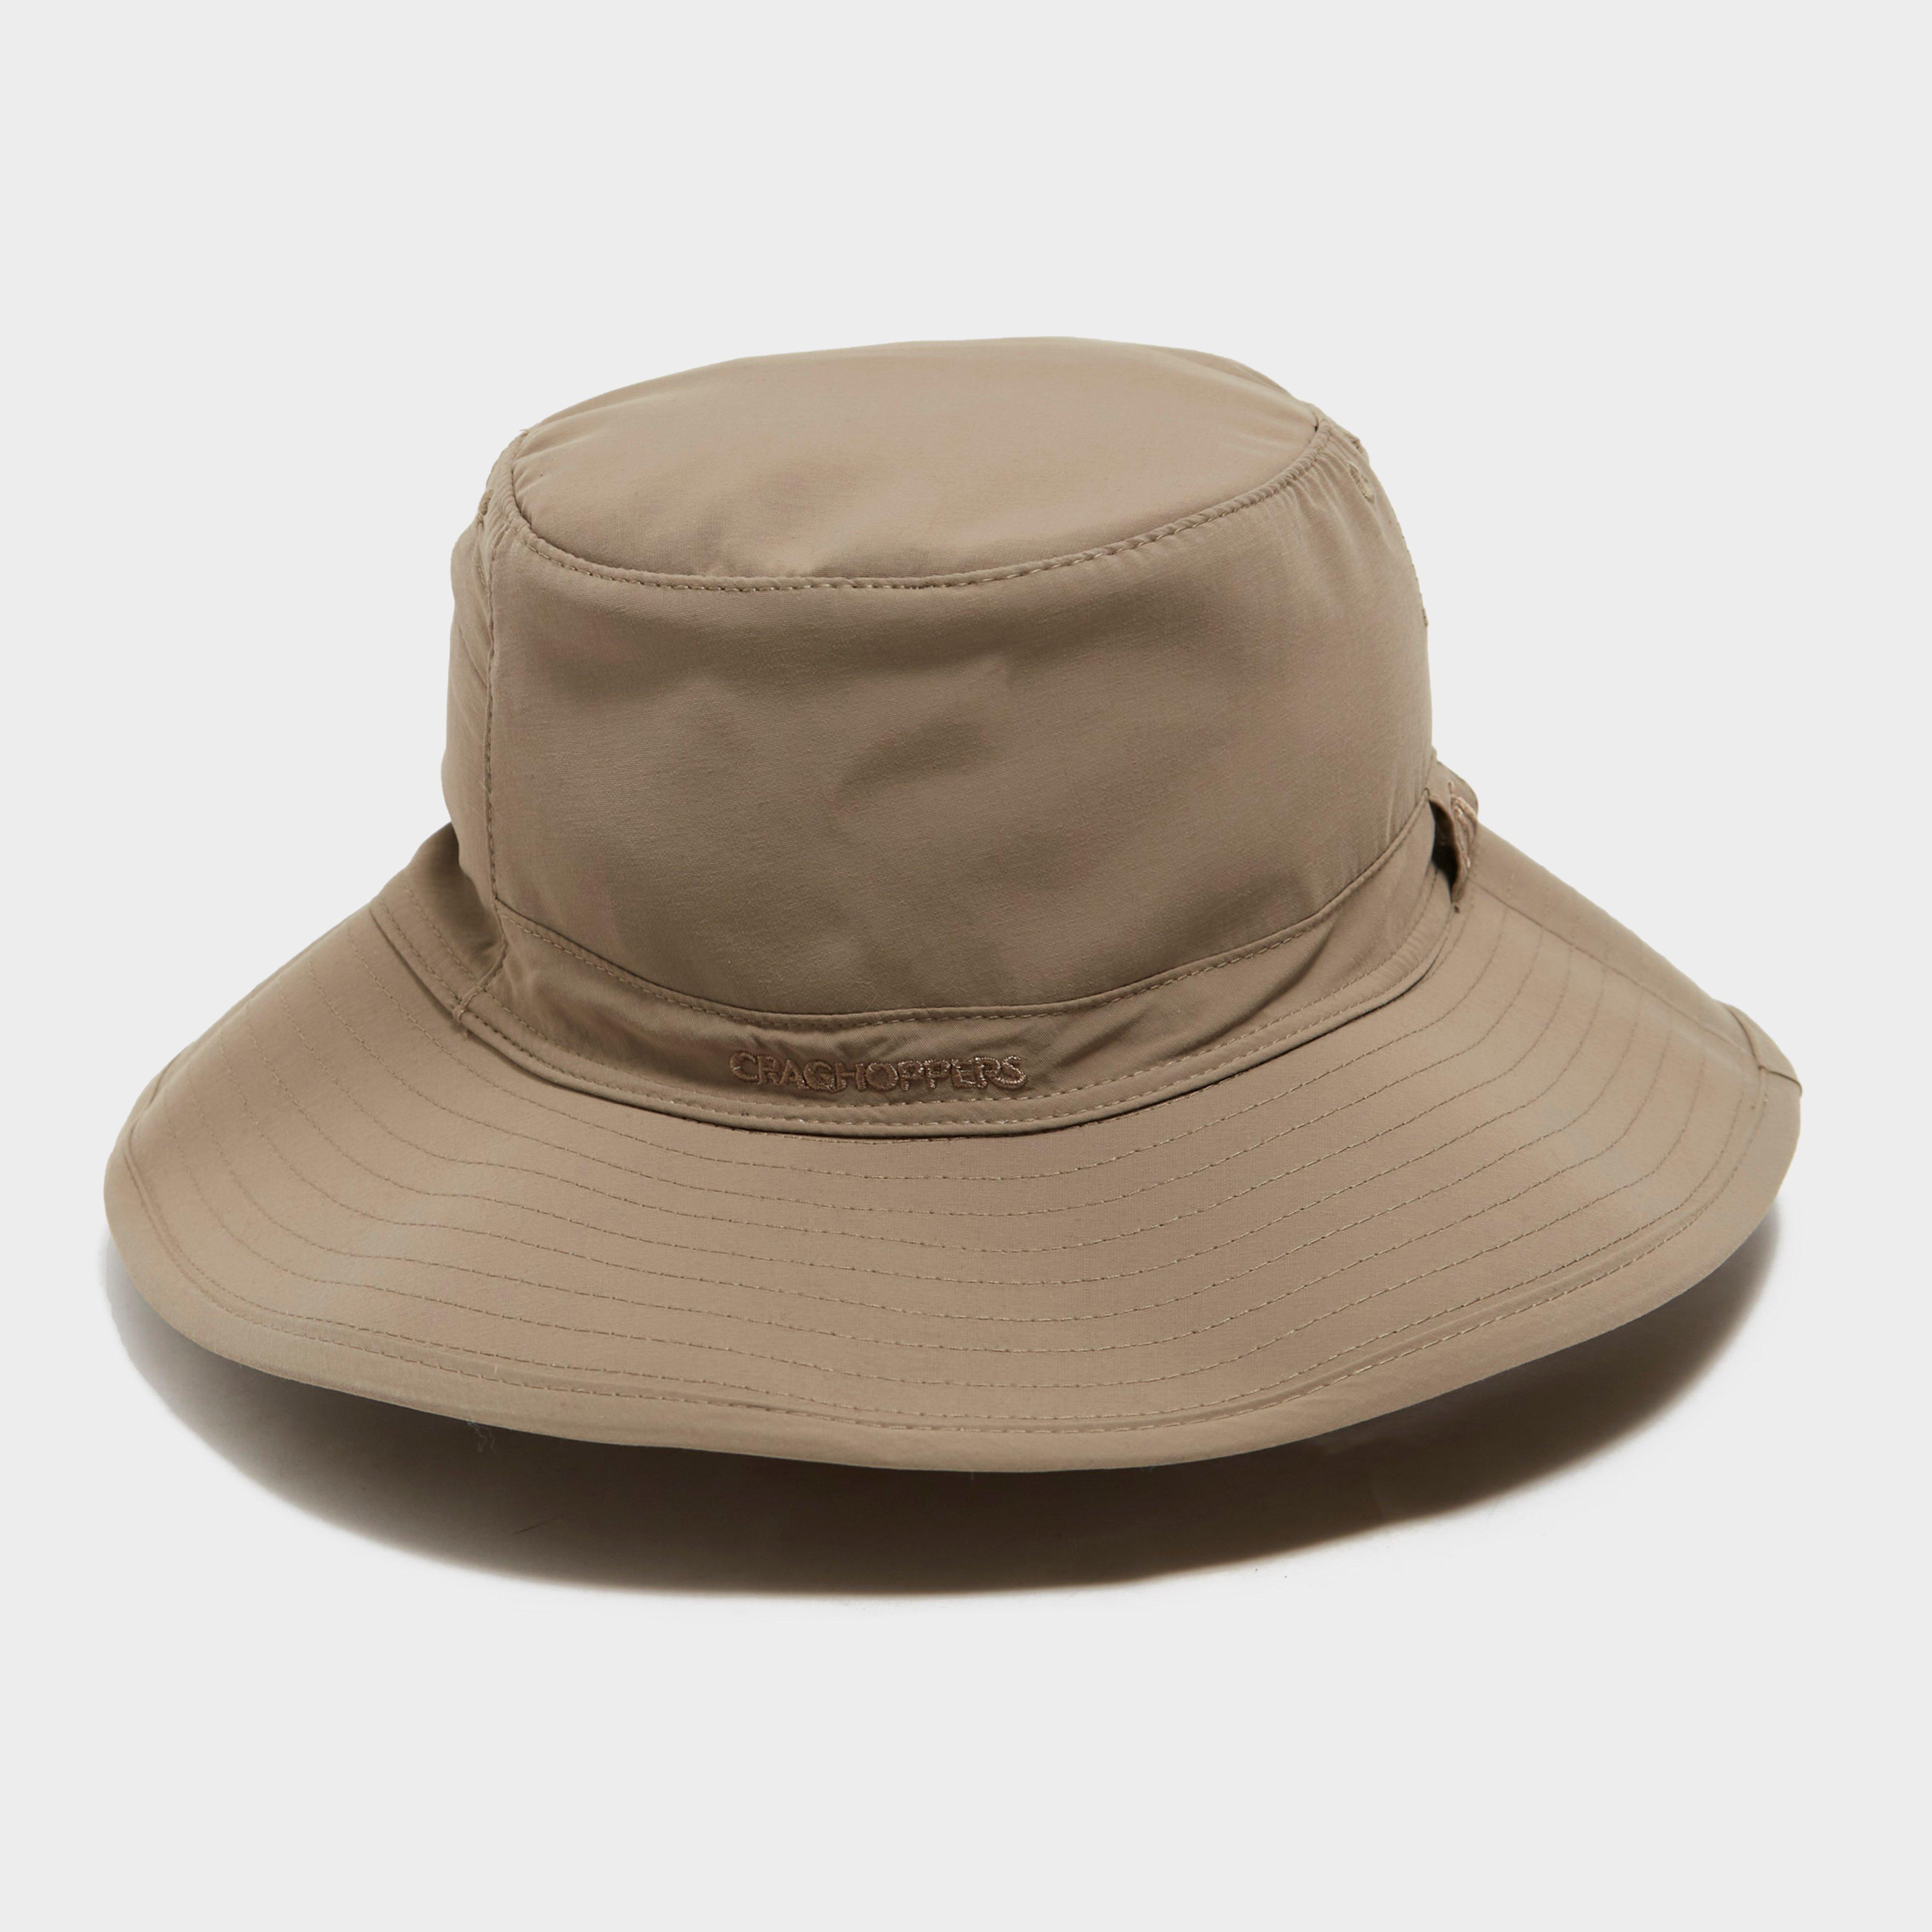 5e9b0b9d55c24 Craghoppers Nosilife Outback Hat